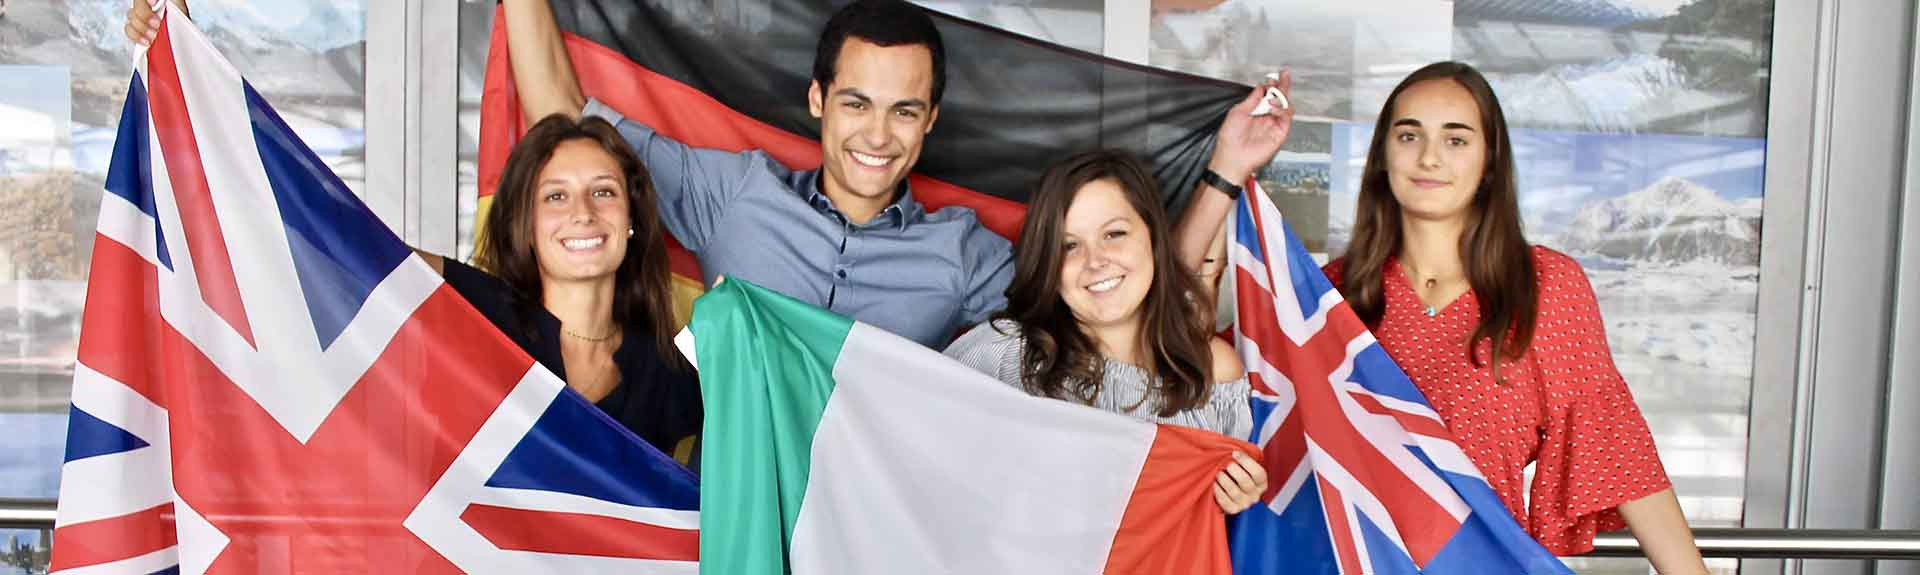 header-international-drapeau